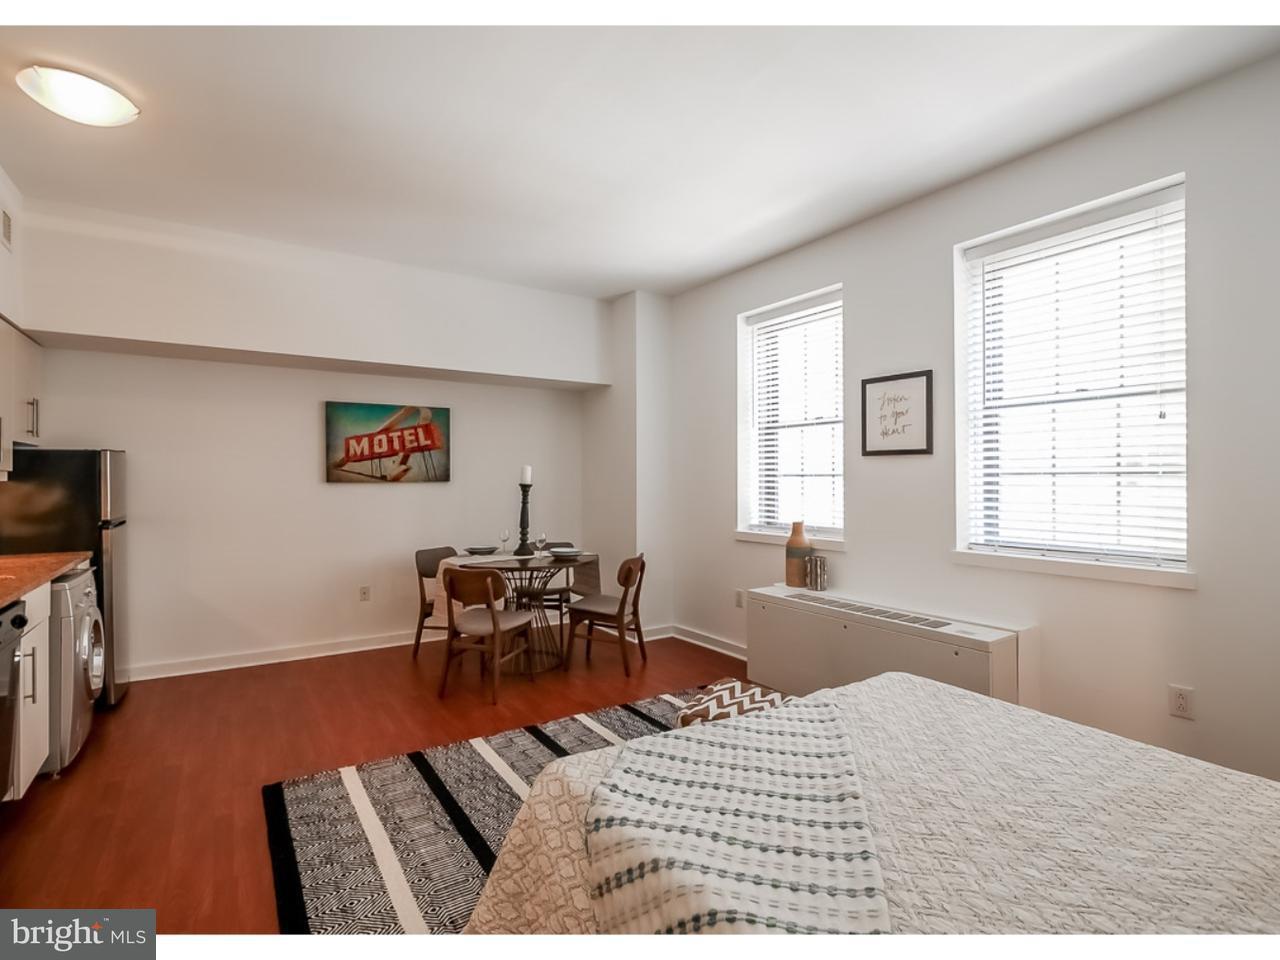 Additional photo for property listing at 219 S 18TH ST #502  Philadelphia, Pennsylvanie 19103 États-Unis